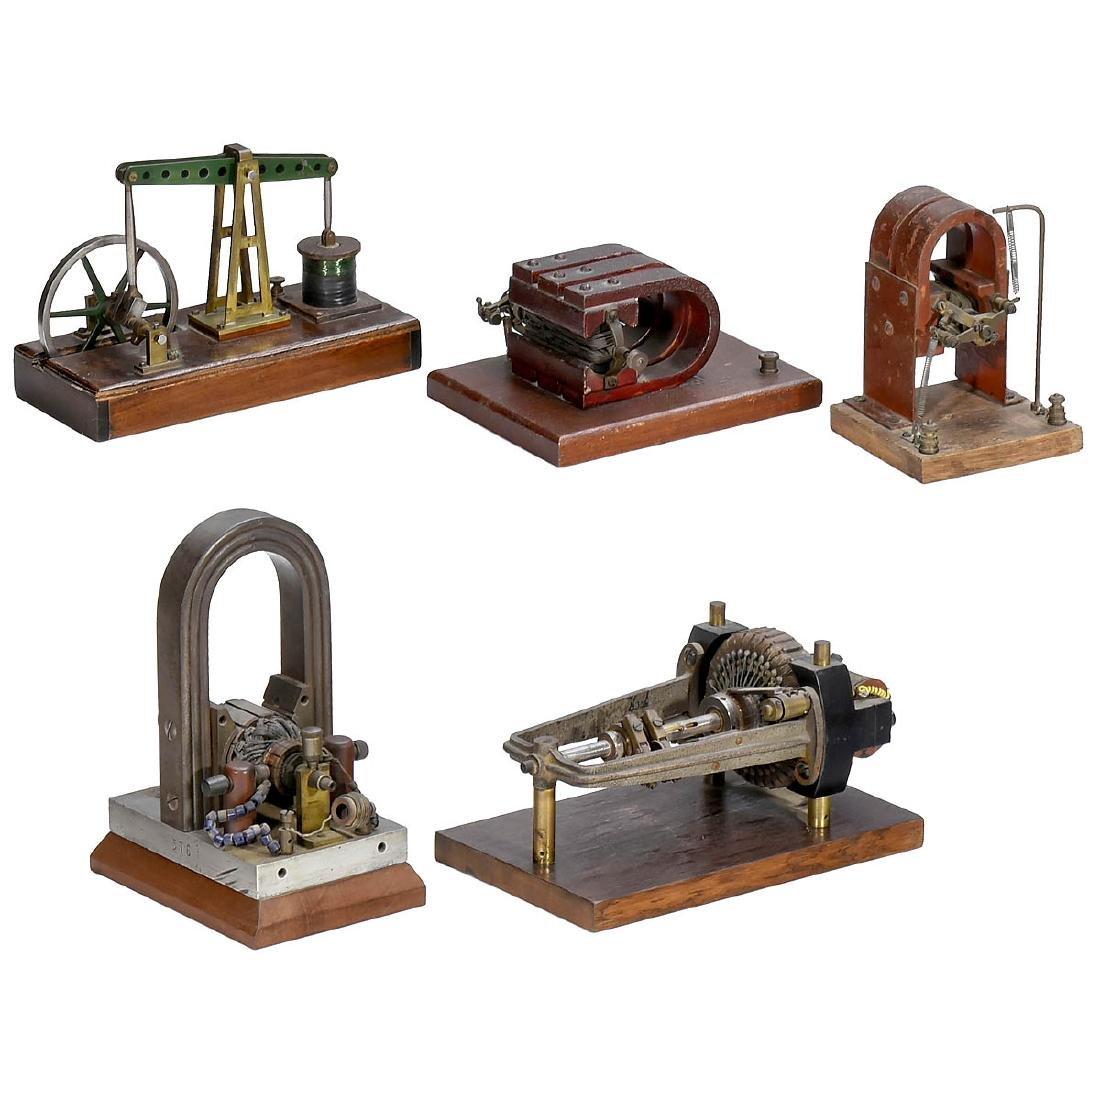 5 Early Electric Motors, c. 1900